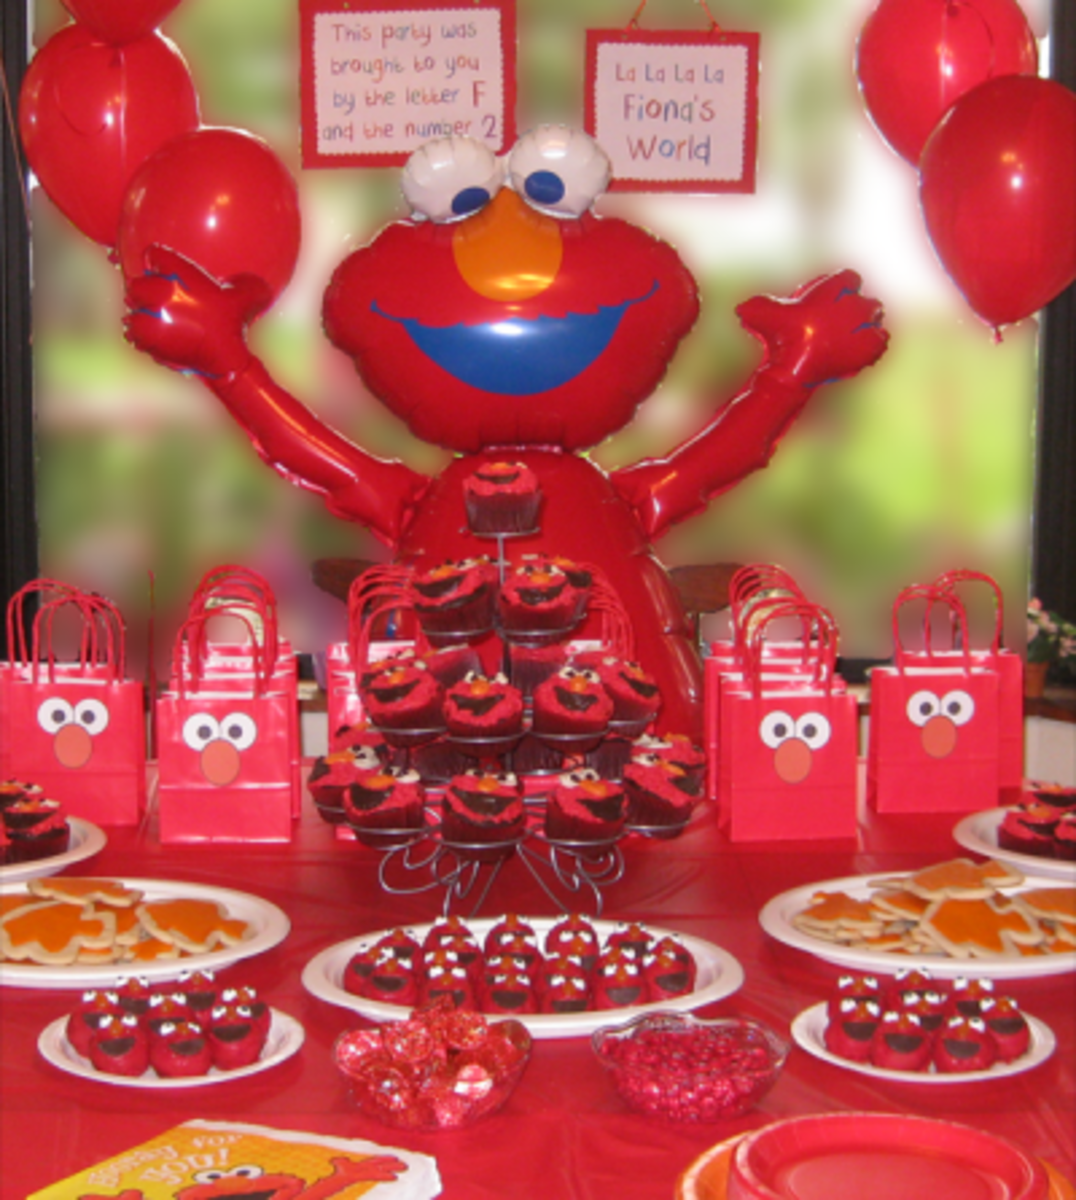 The Elmo Dessert Table!